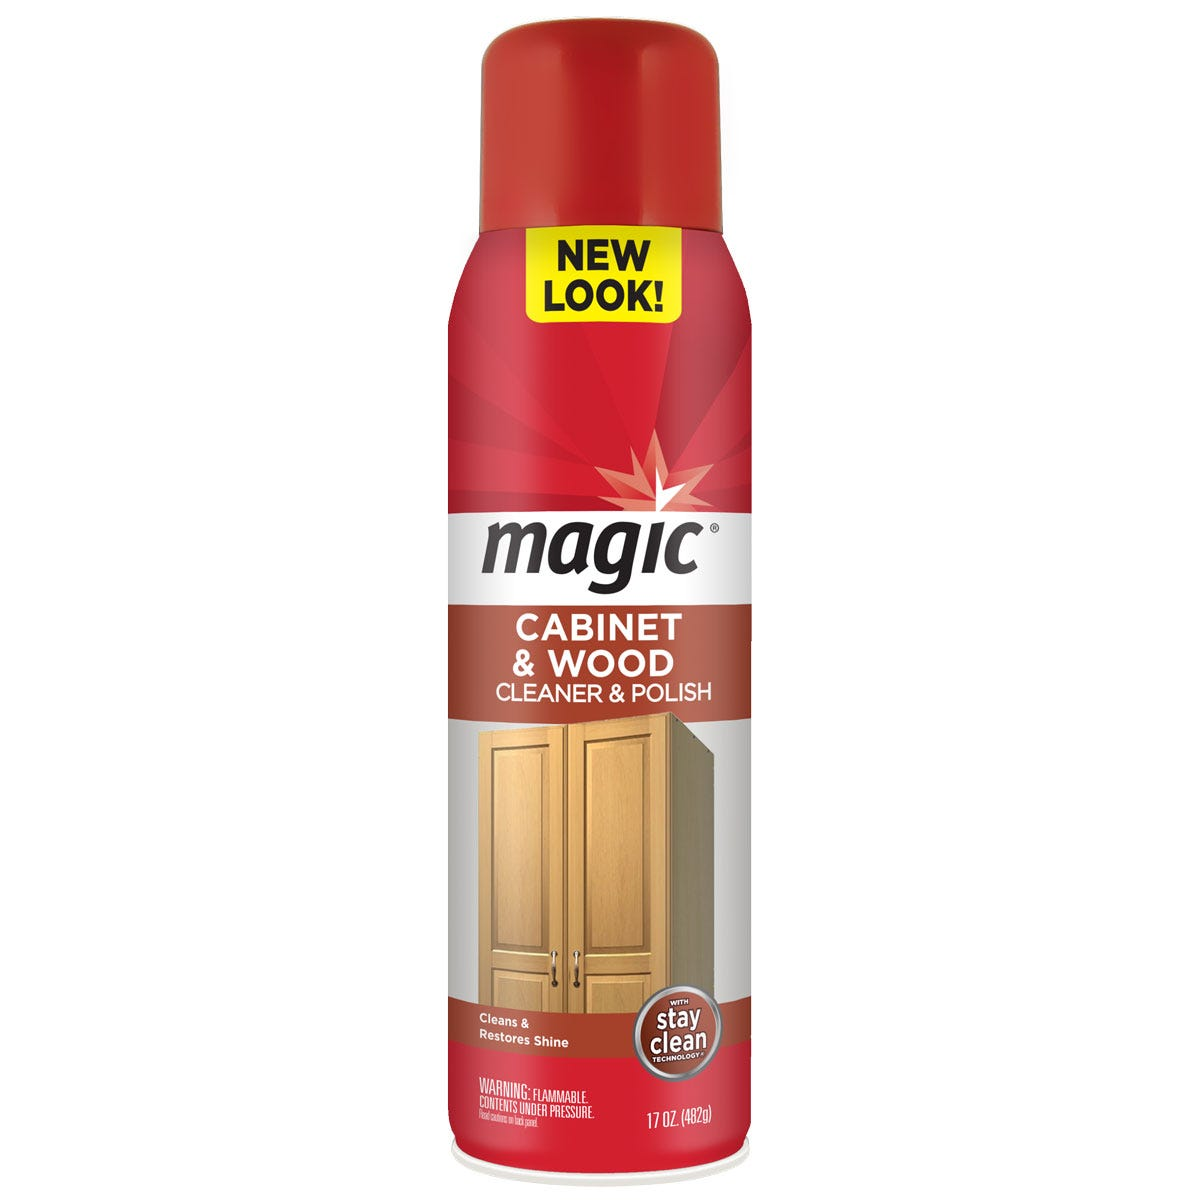 https://googone.com/media/catalog/product/c/a/cabinet-cleaner-_-polish-aerosol_front.jpg